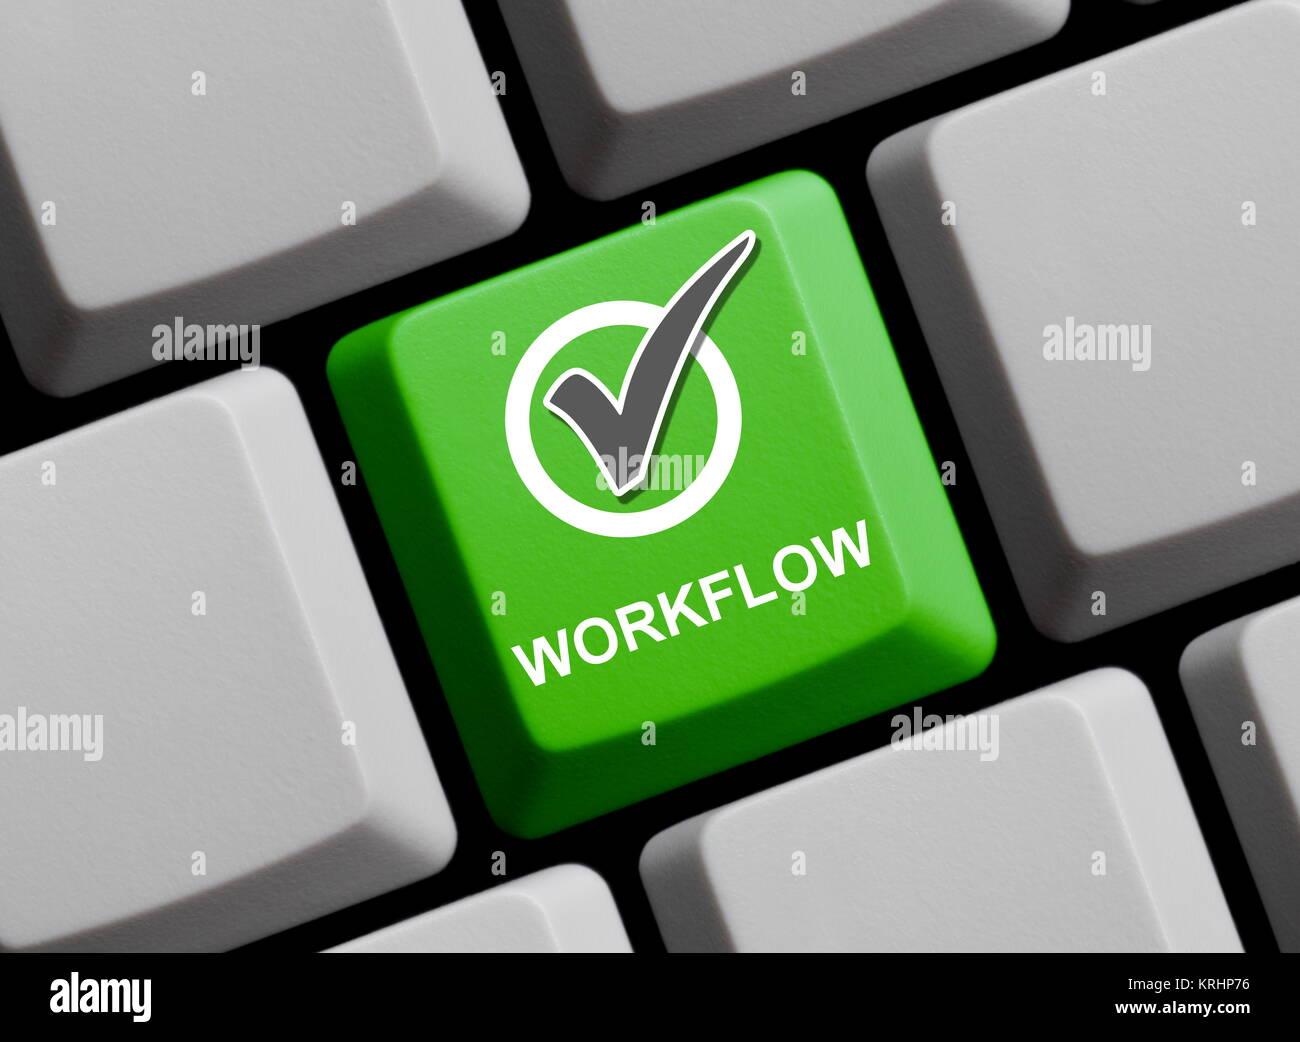 workflow online - Stock Image